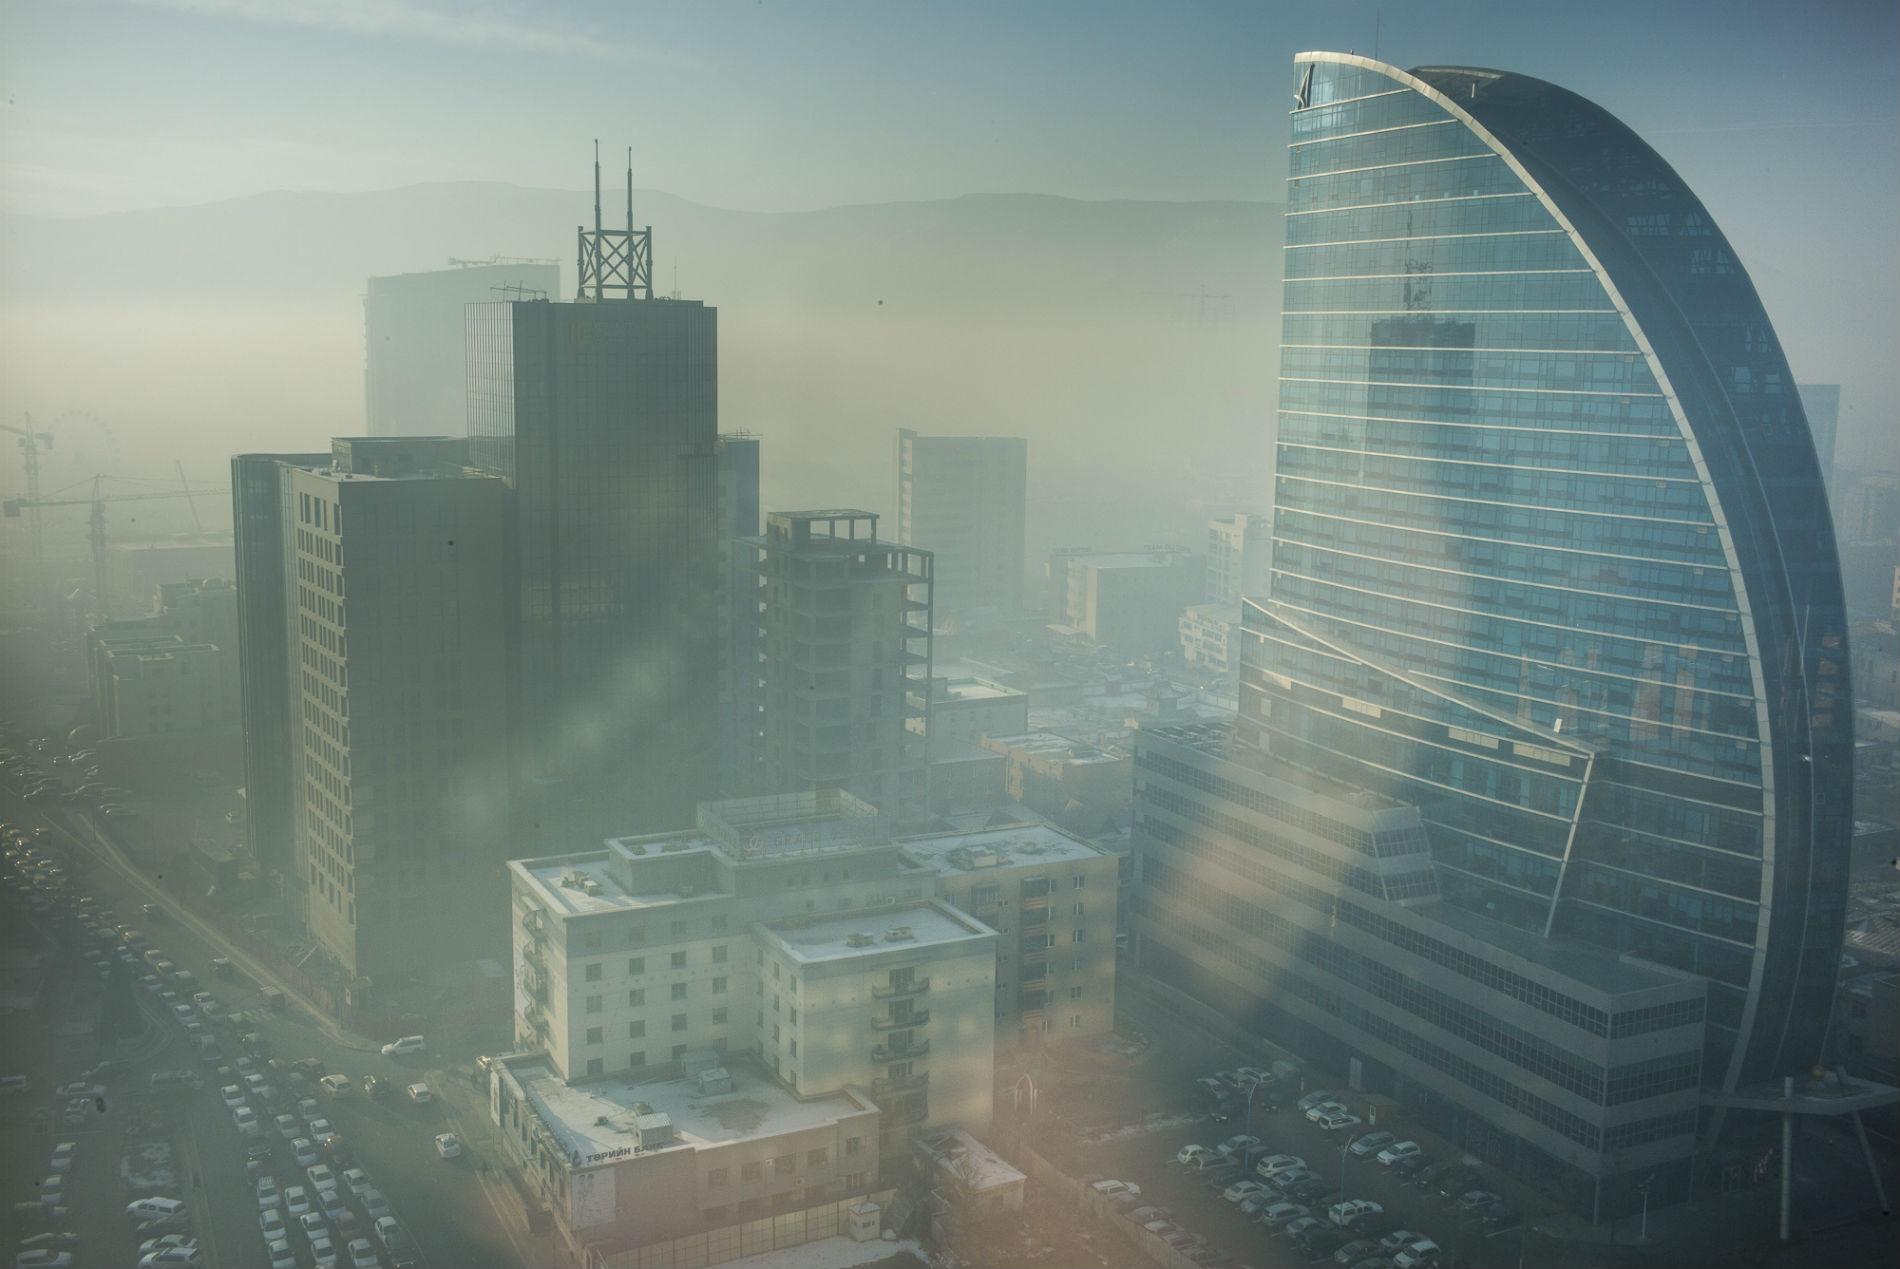 Ulaanbaatar Skyline Photo by Sven Zellner